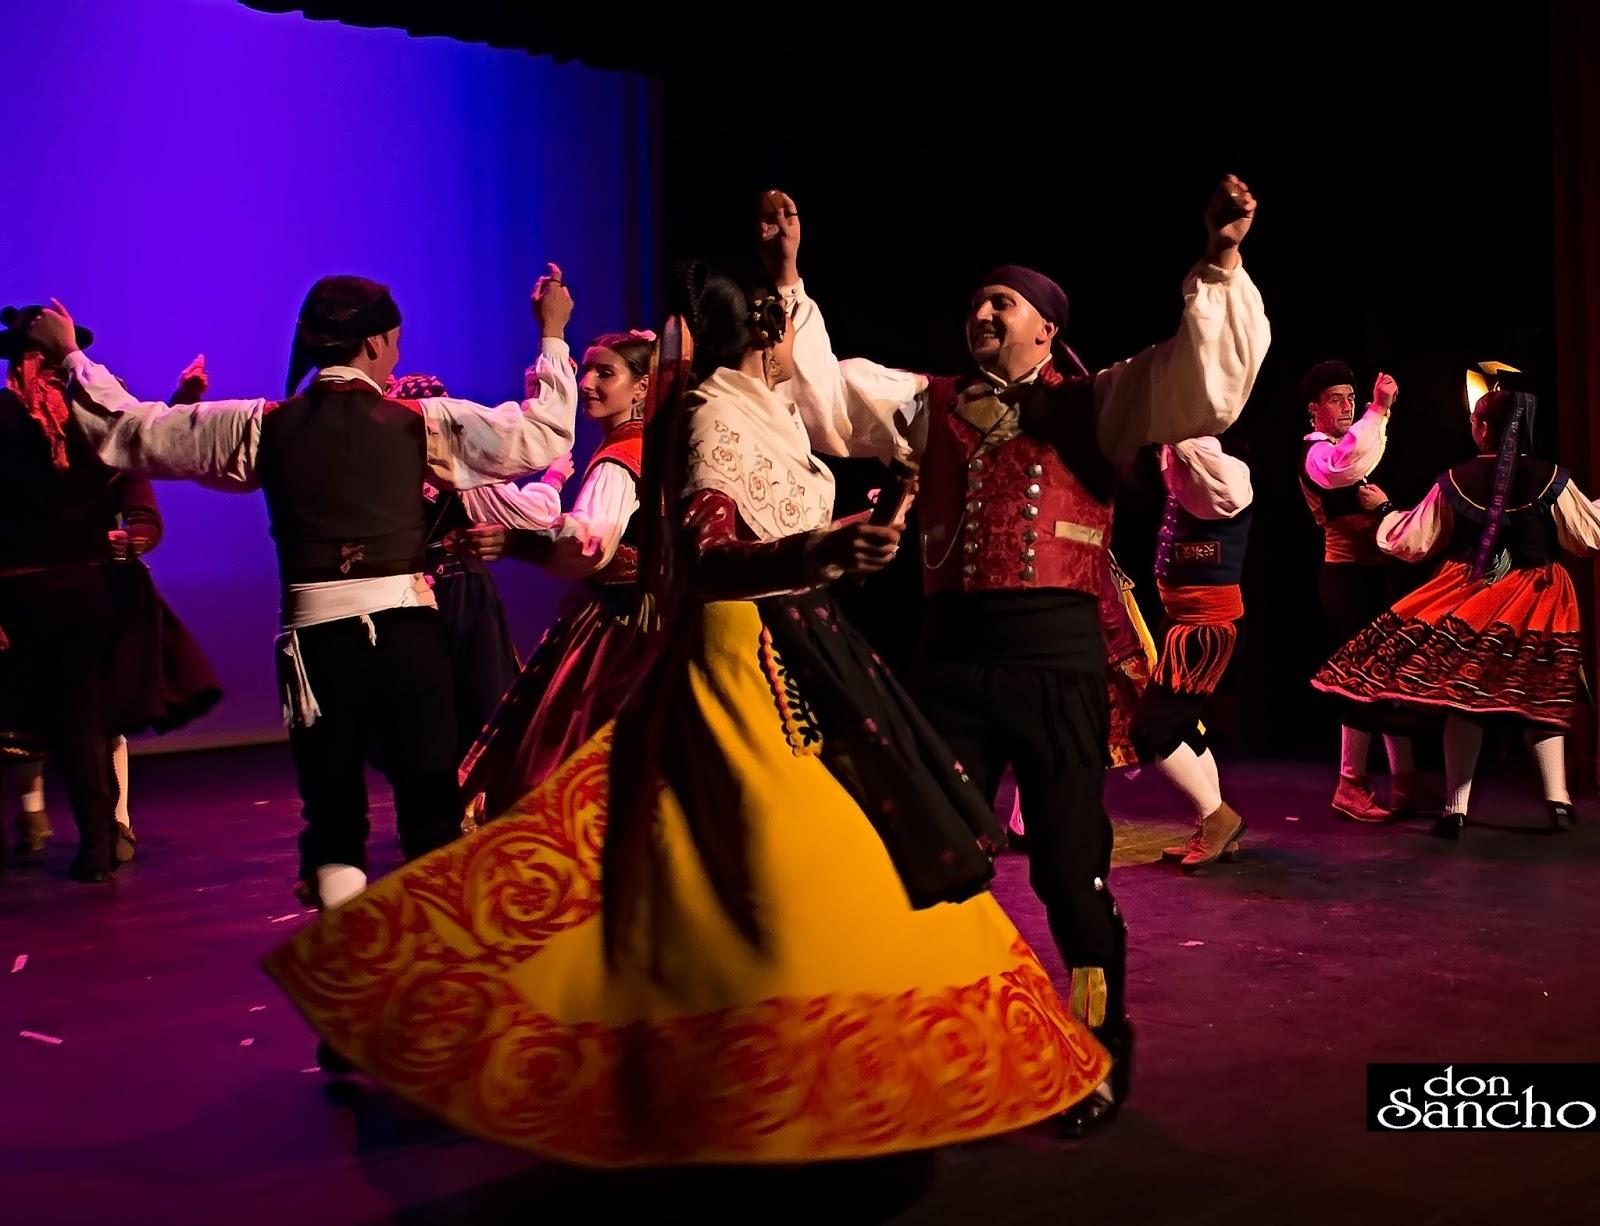 DON SANCHO. Difusión de la Cultura Tradicional de Zamora ... - photo#21